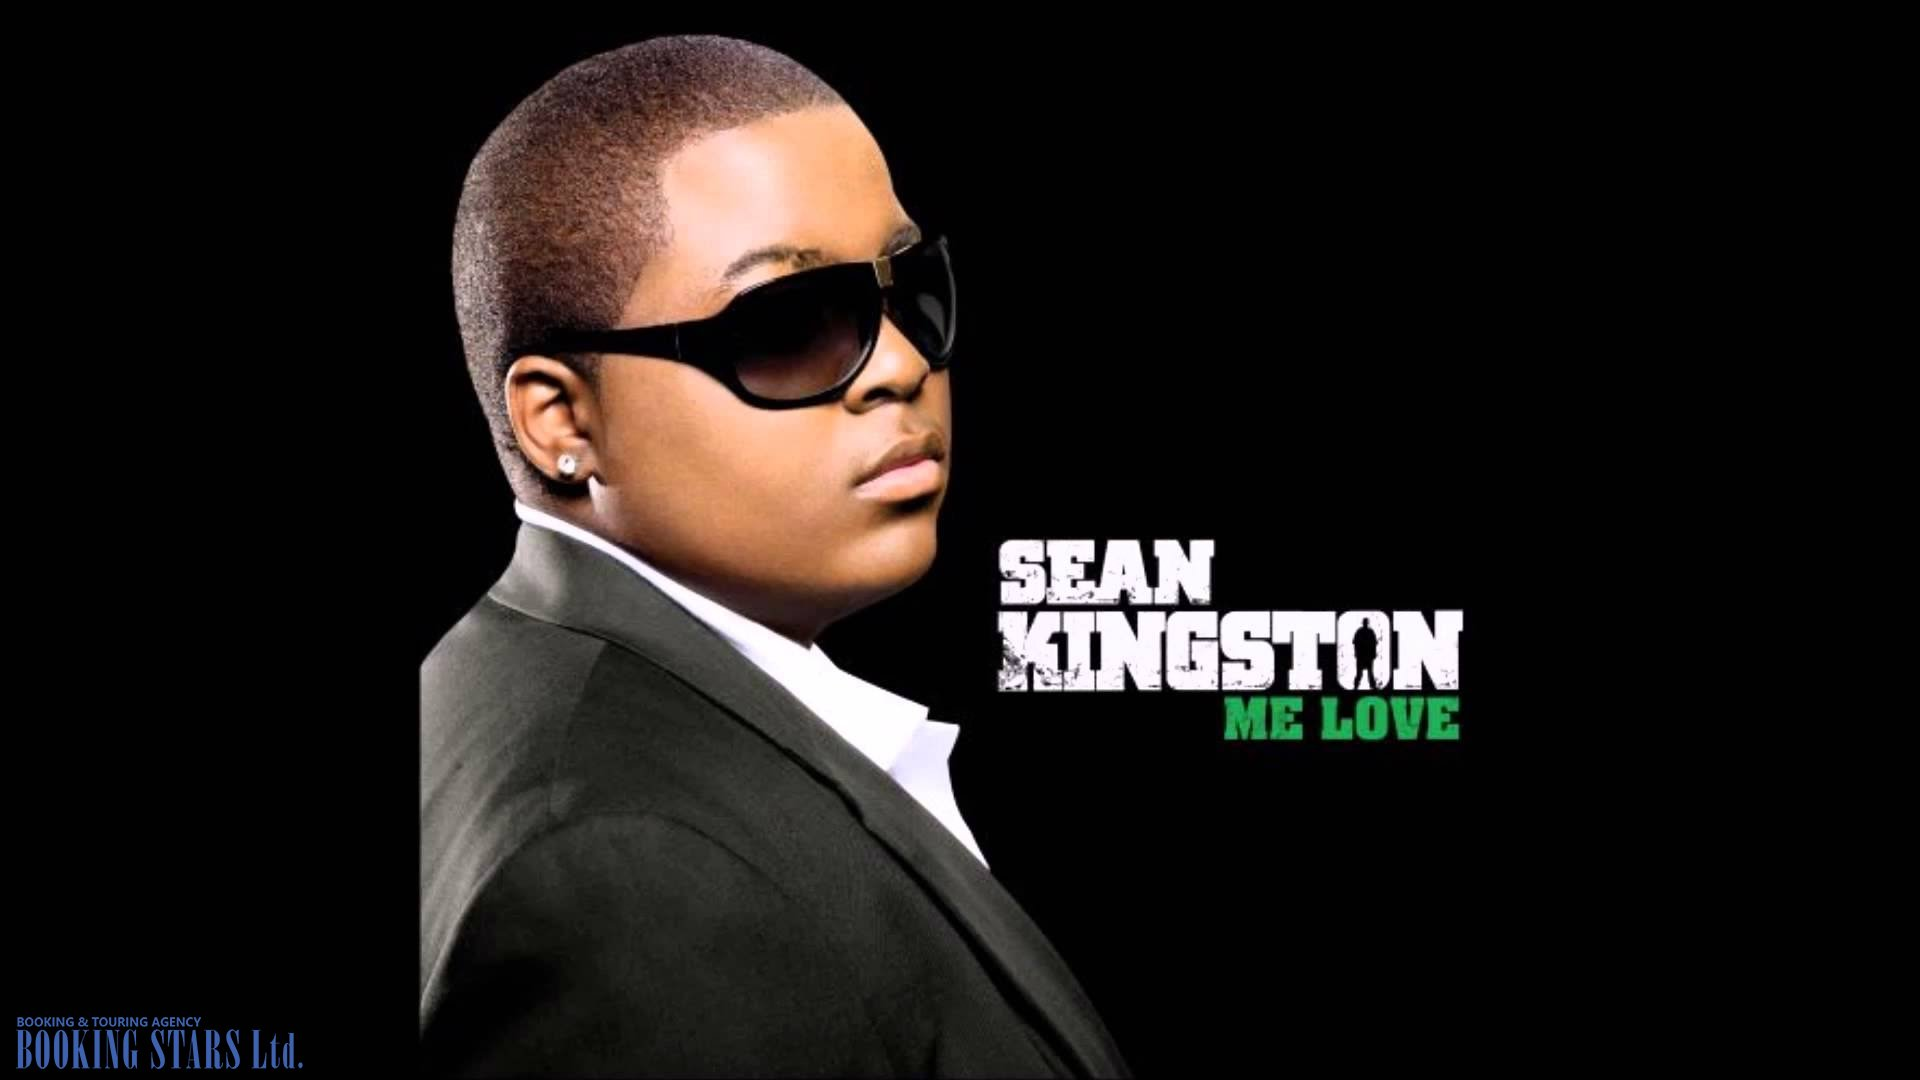 sean kingston mixtape